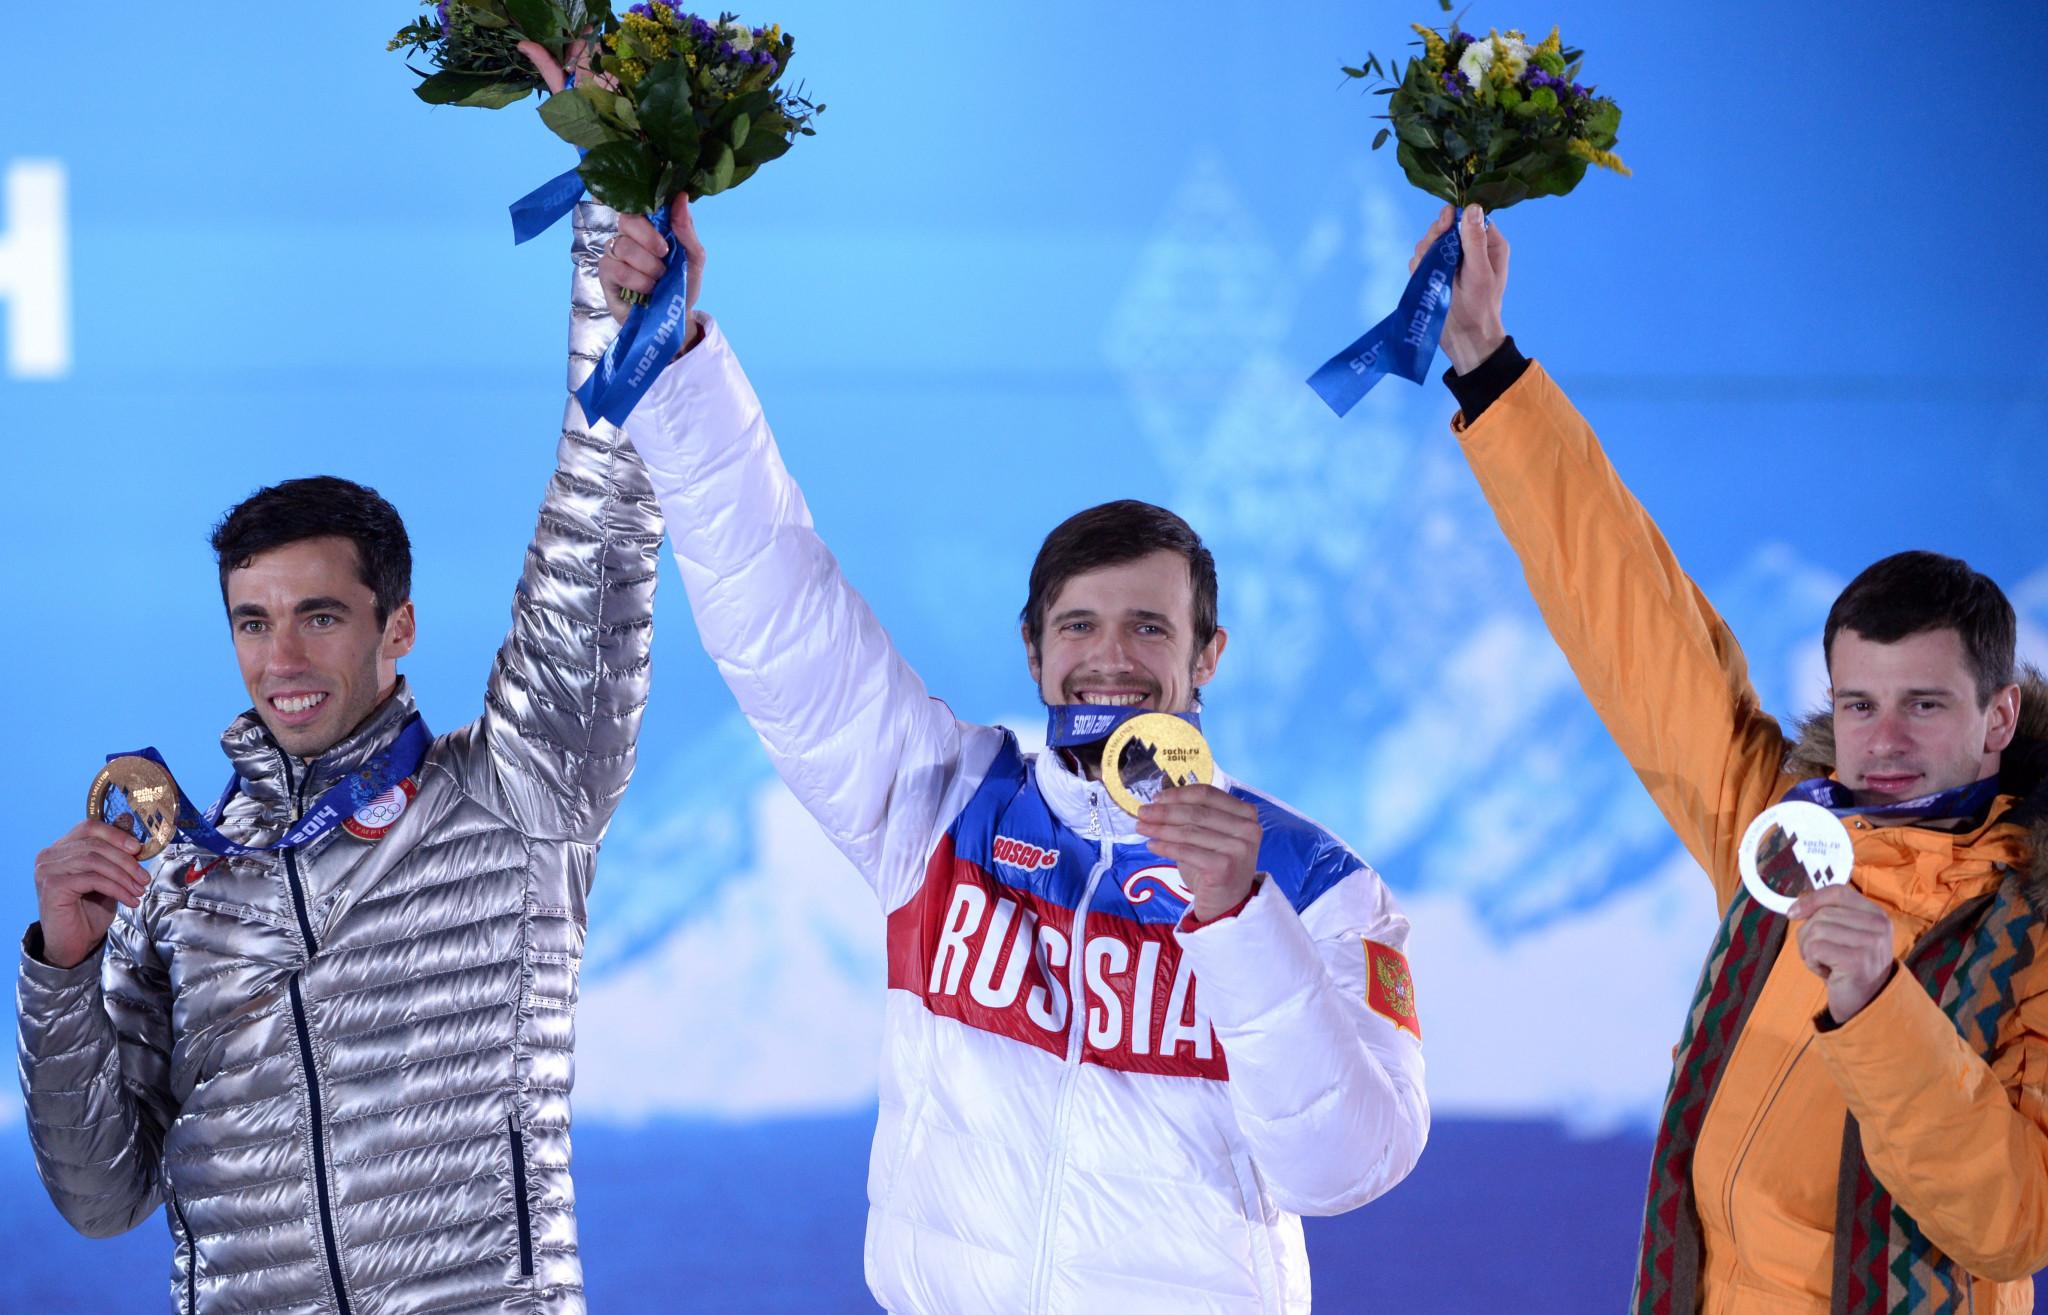 Sochi 2014 skeleton gold medallist Aleksander Tretiakov is among the 28 athletes to have their sanction overturned ©Getty Images